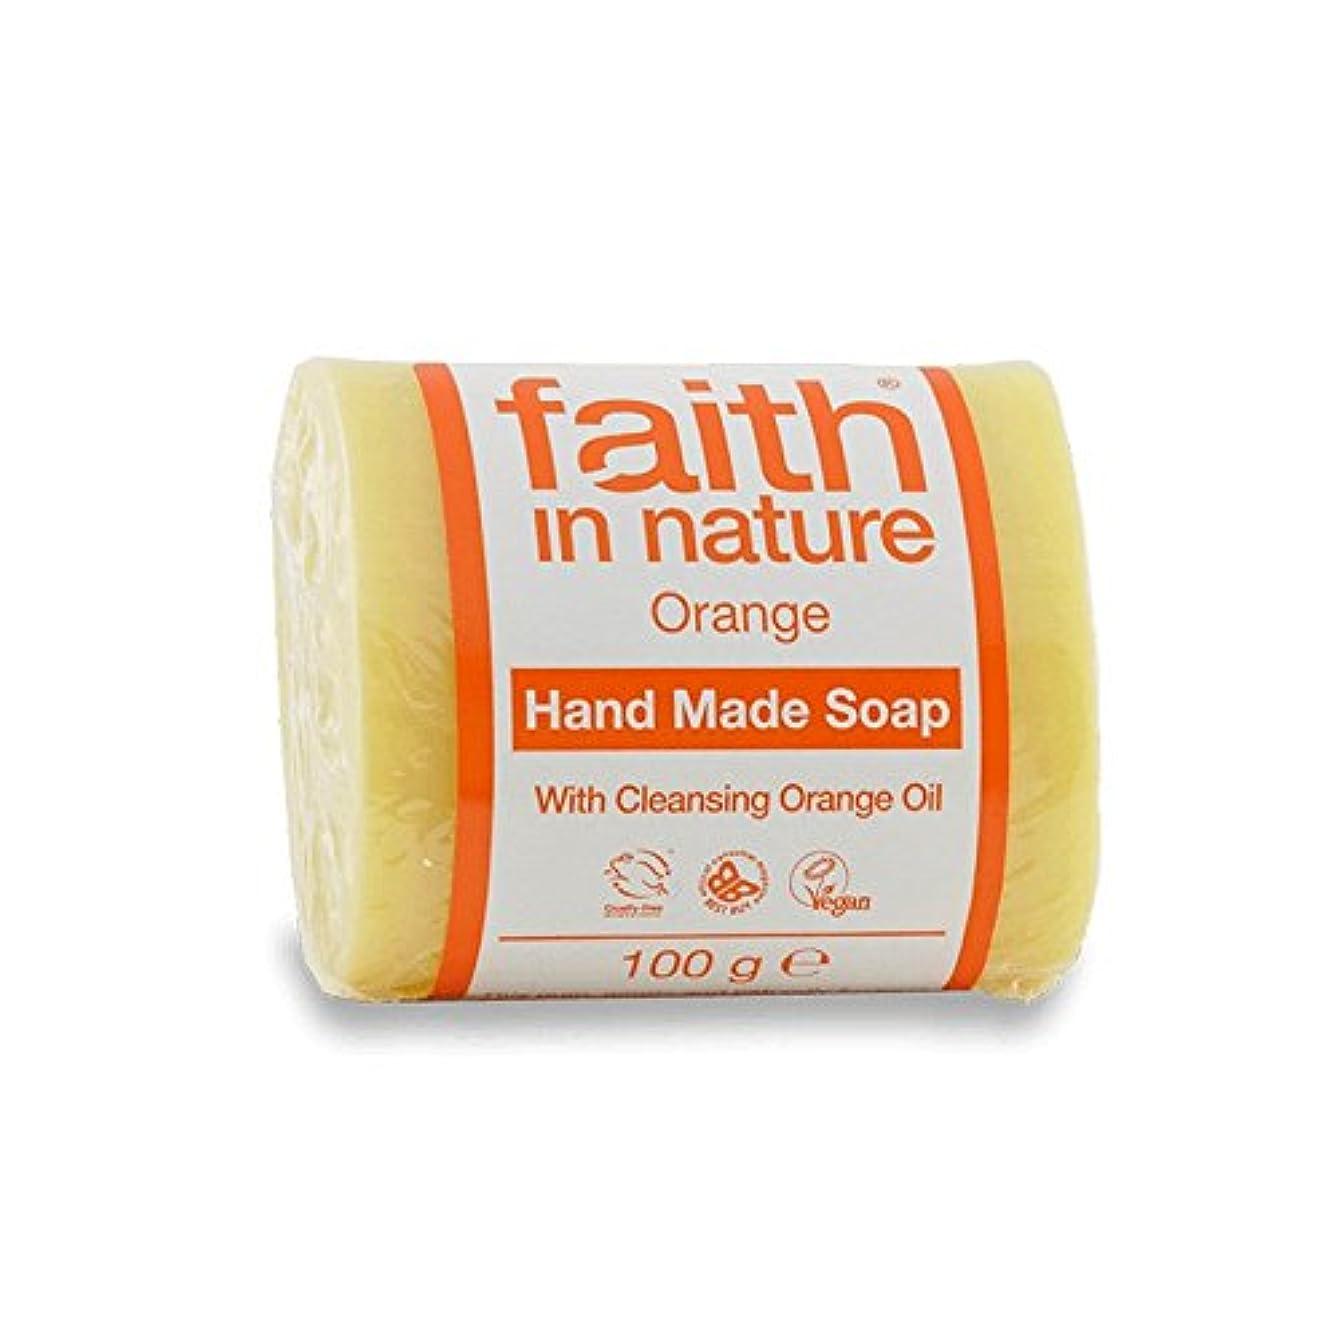 Faith in Nature Orange Soap 100g (Pack of 6) - 自然オレンジ色の石鹸100グラムの信仰 (x6) [並行輸入品]